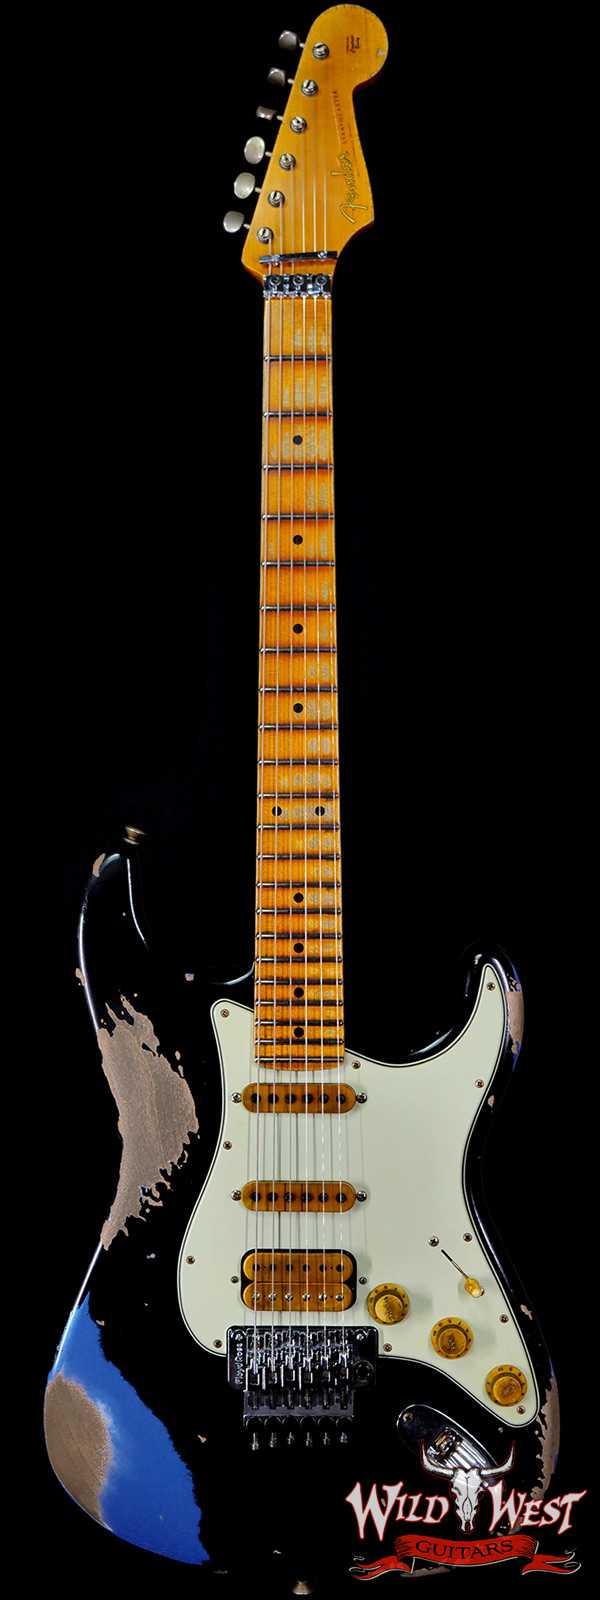 Fender Custom Shop Wild West Black Lightning Stratocaster Floyd Rose Heavy Relic Maple Board 22 Lake Placid Blue